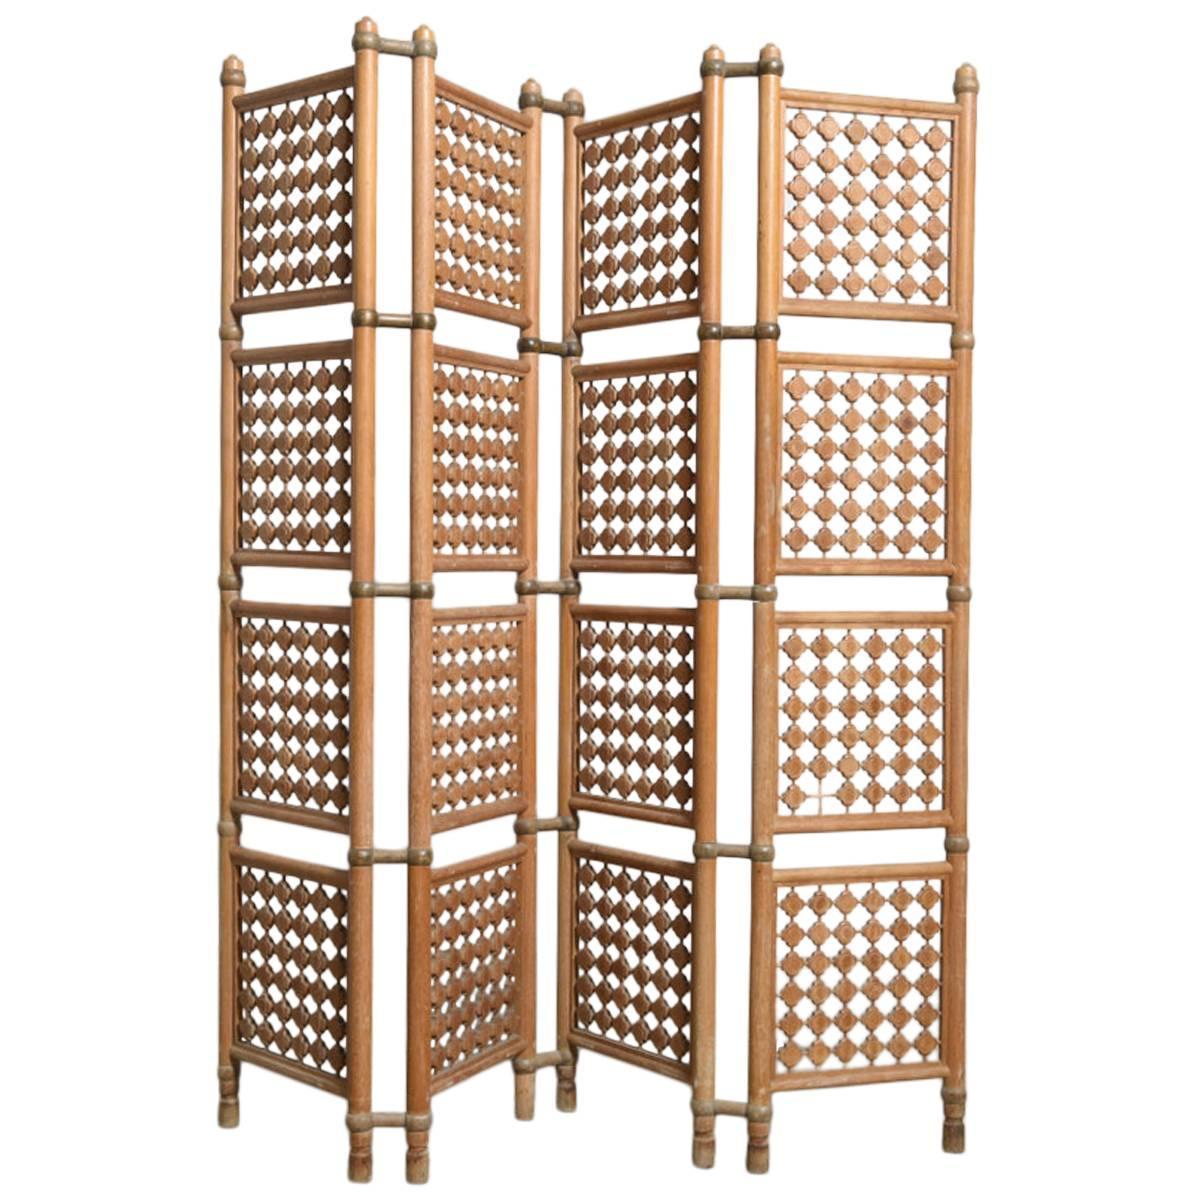 Four-Panel Danish Solid Walnut Room Divider